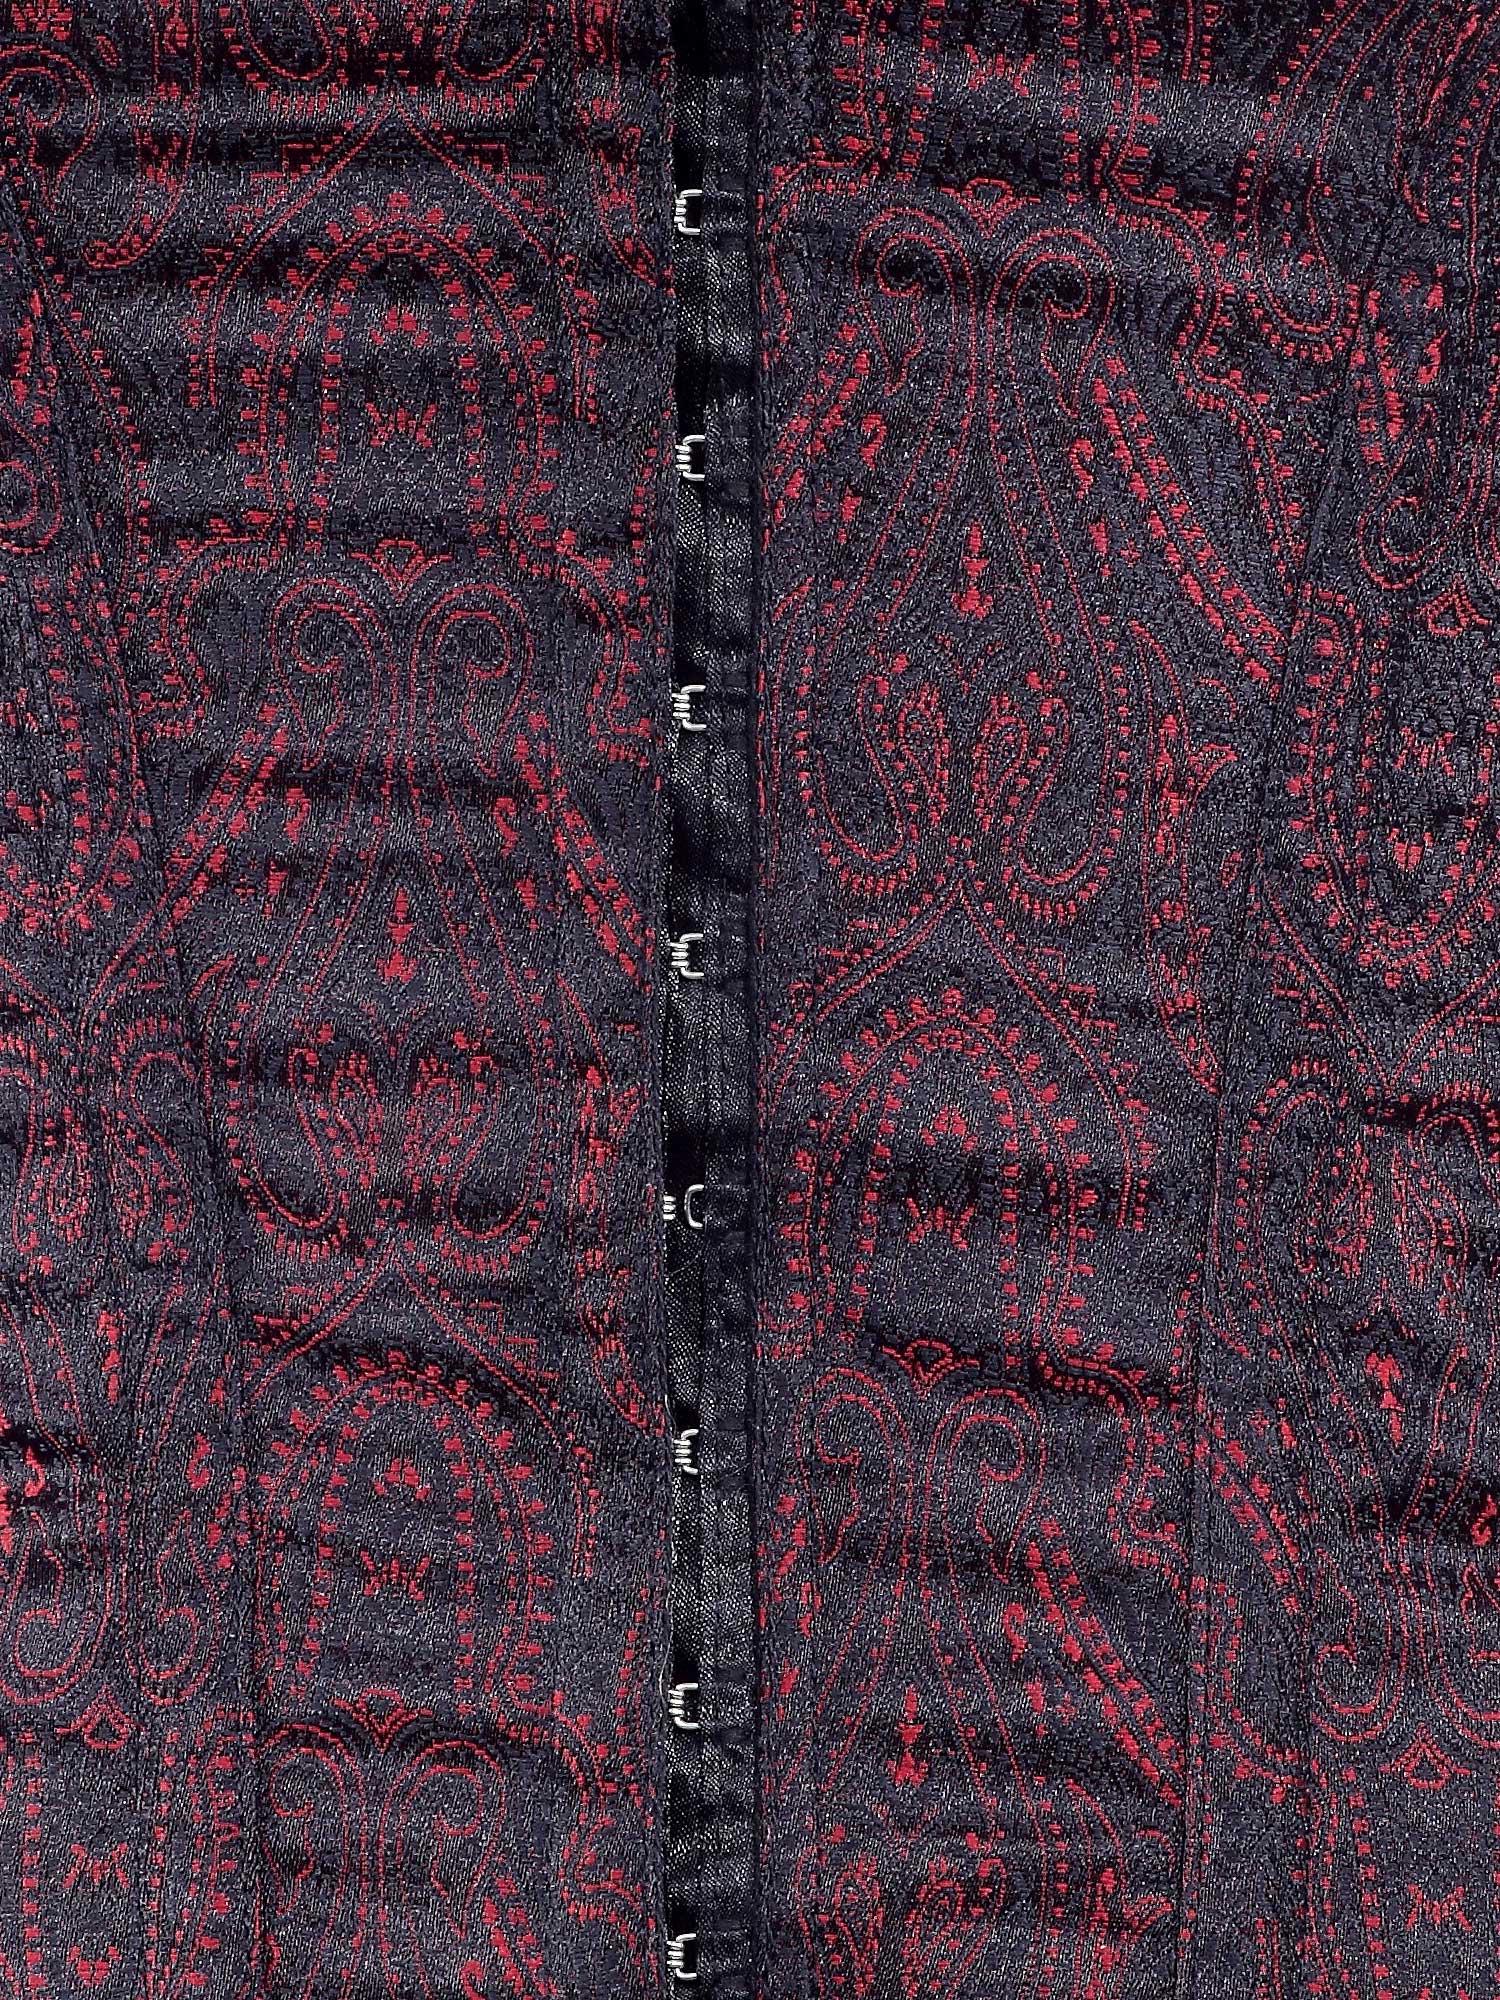 brown_jacquard_fabric_steel_boning_underbust_corset_waist_cincher_bustier_bustiers_and_corsets_2.jpg